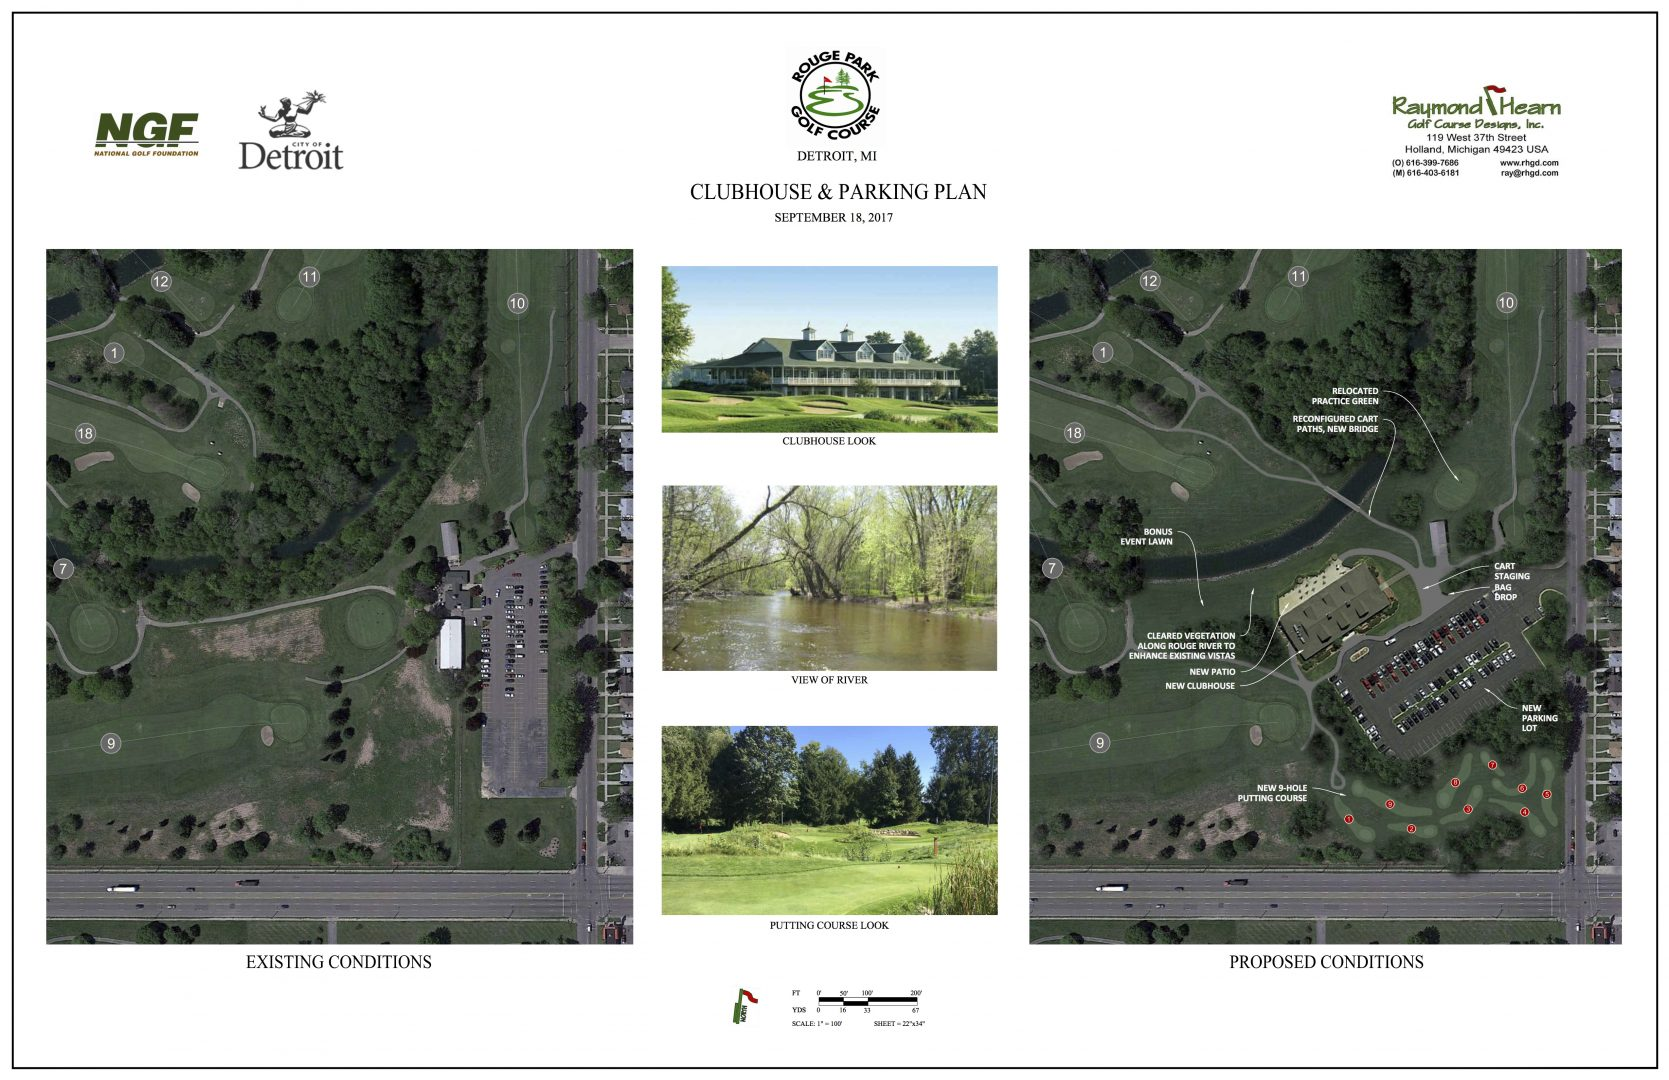 Rouge Park Municipal Golf Course | Raymond Hearn Golf Course